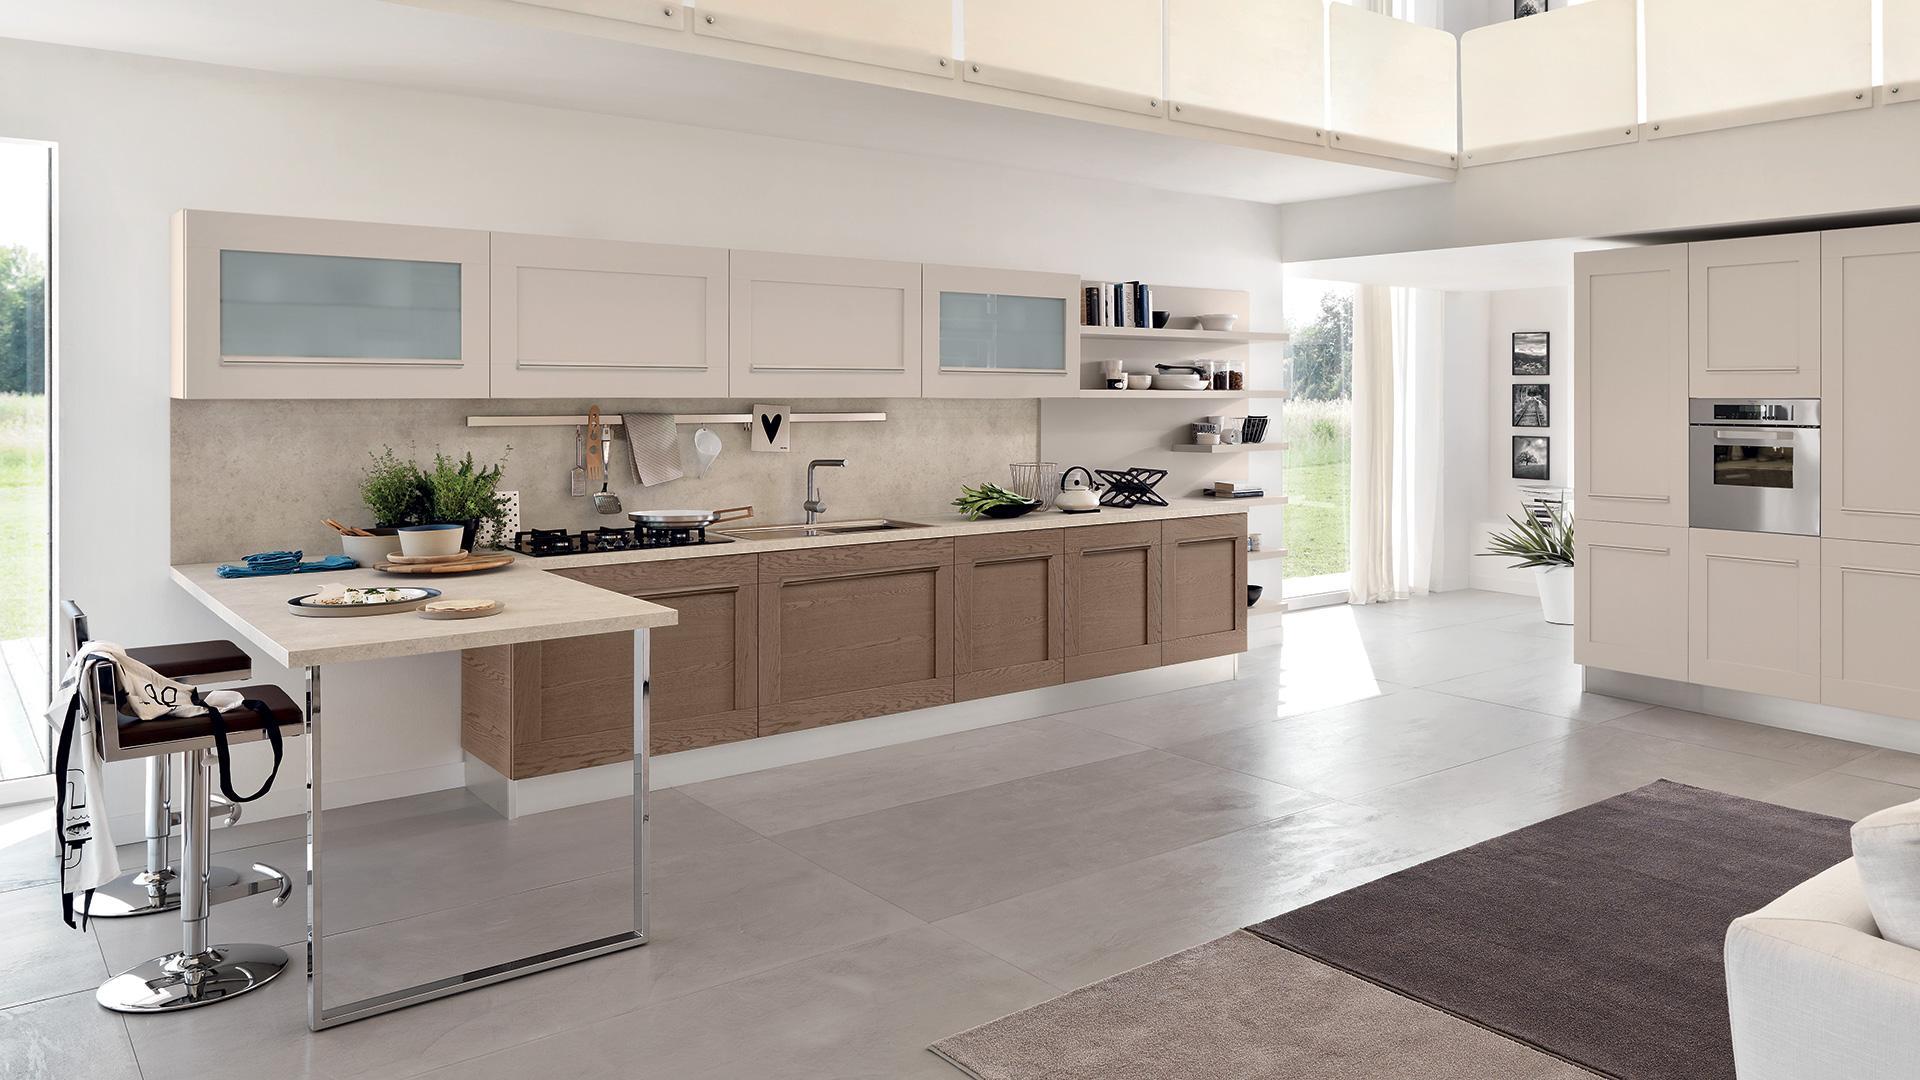 Piastrelle Moderne Per Cucina. Amazing Mattonelle Da Cucina Moderne ...